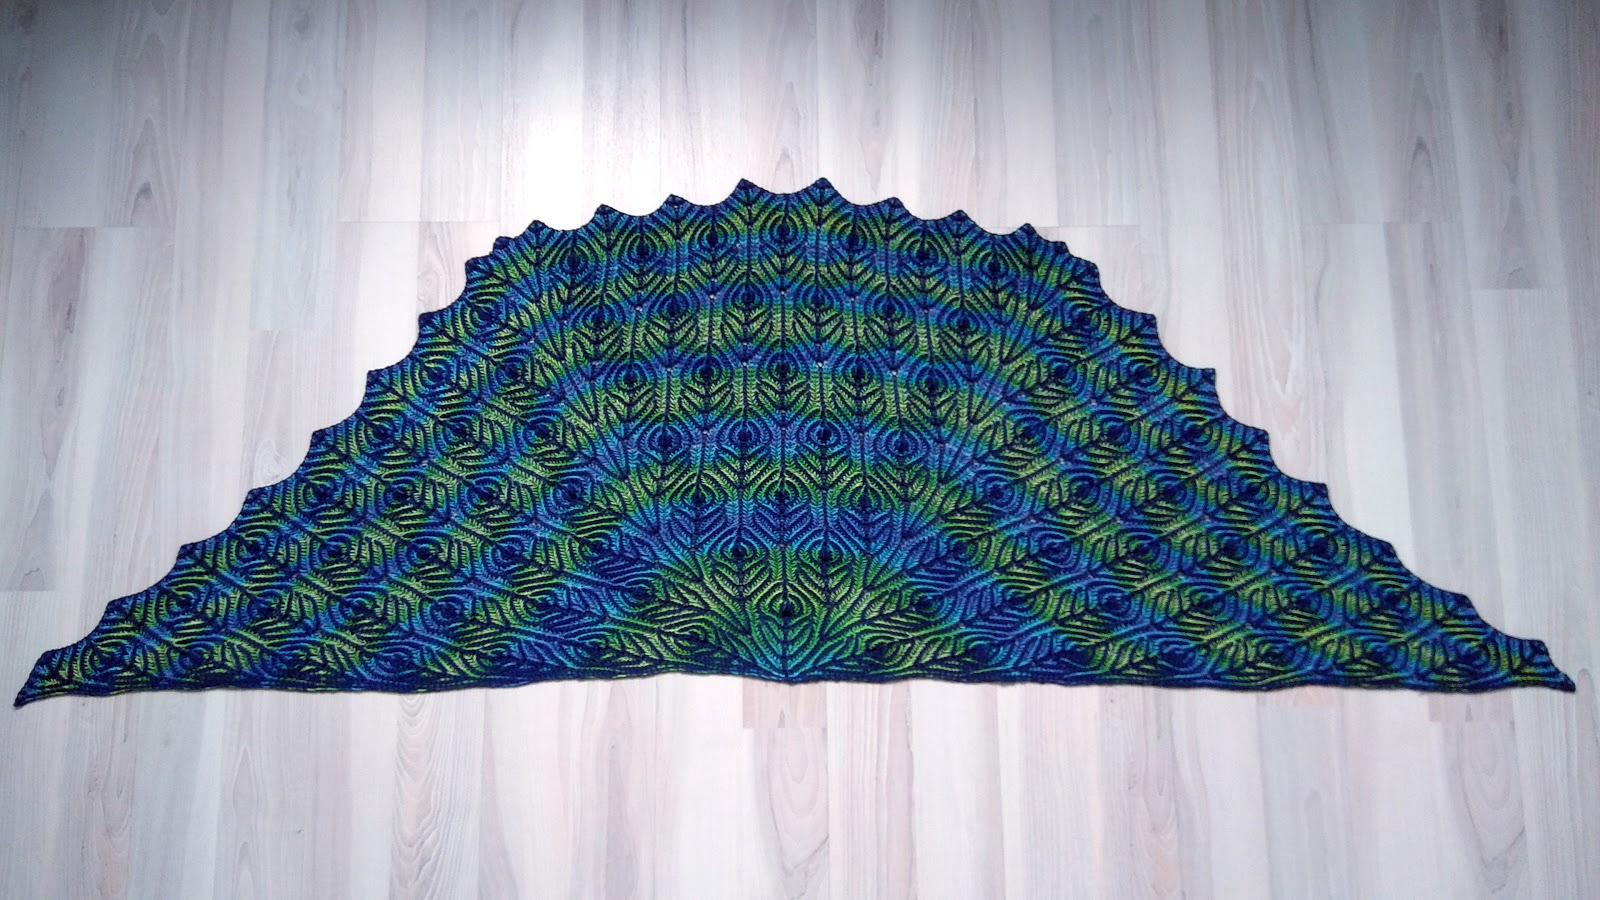 Peacock Shawl - Brioche Knitting